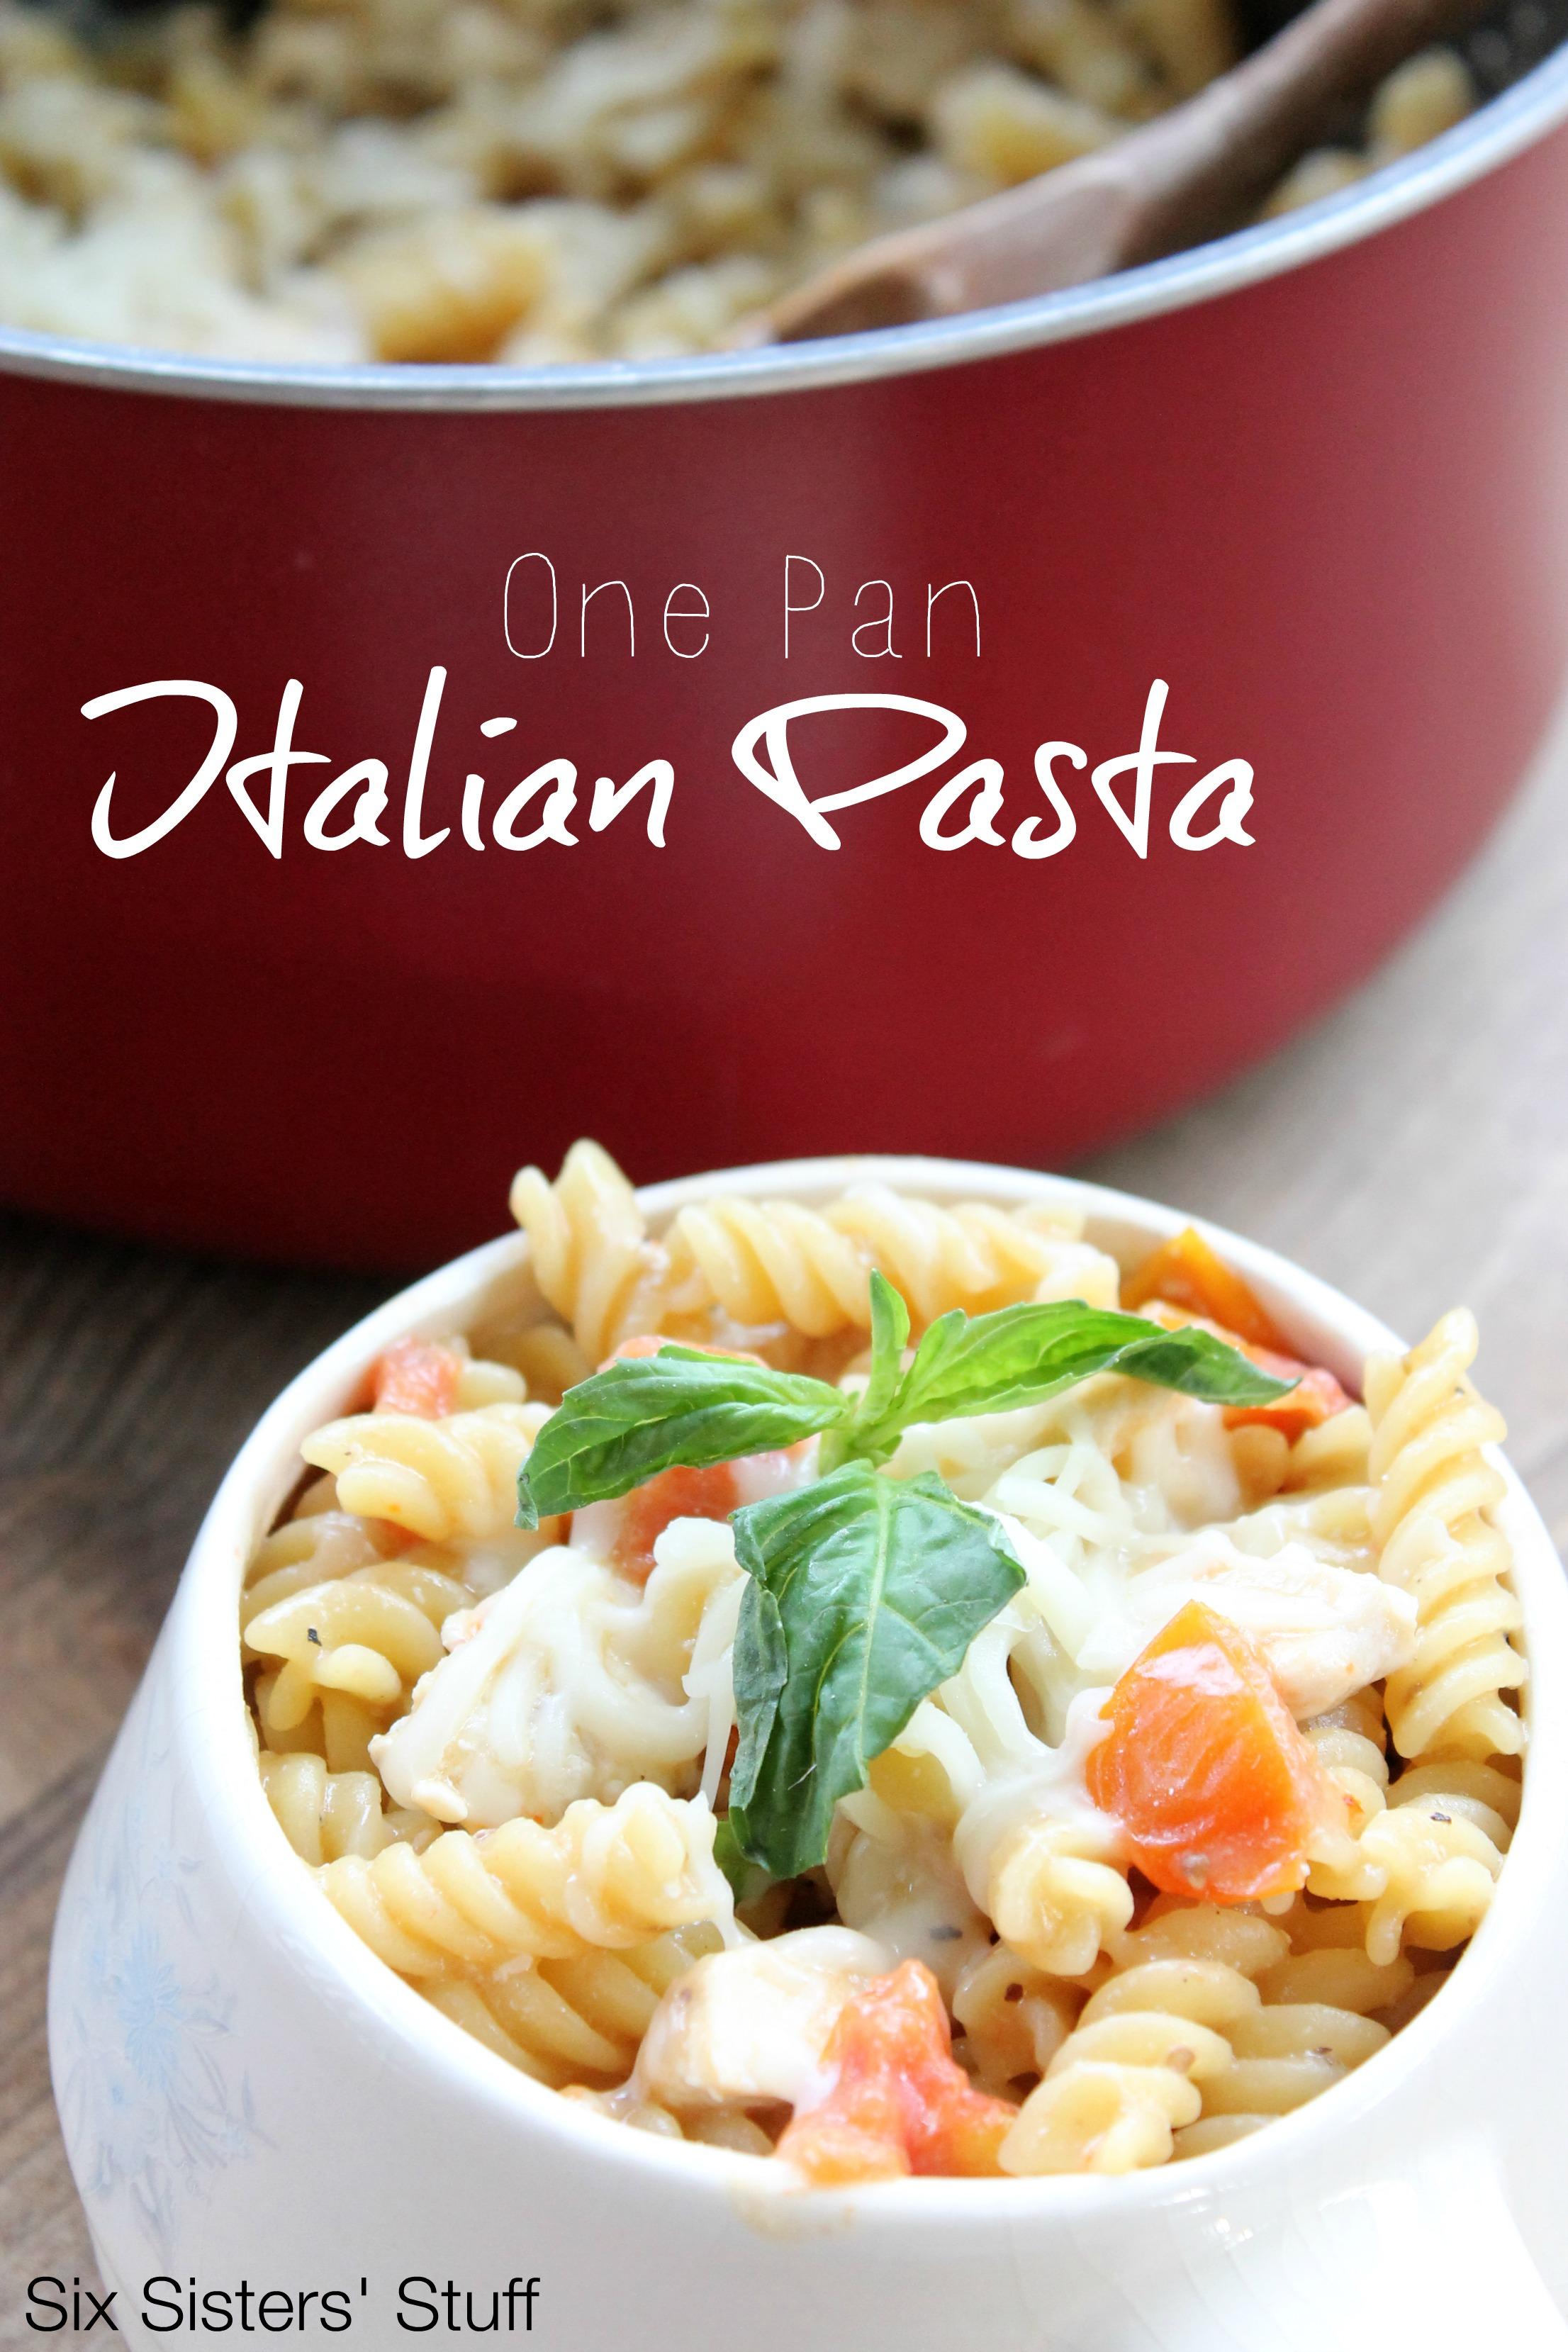 One Pan Italian Pasta Recipe